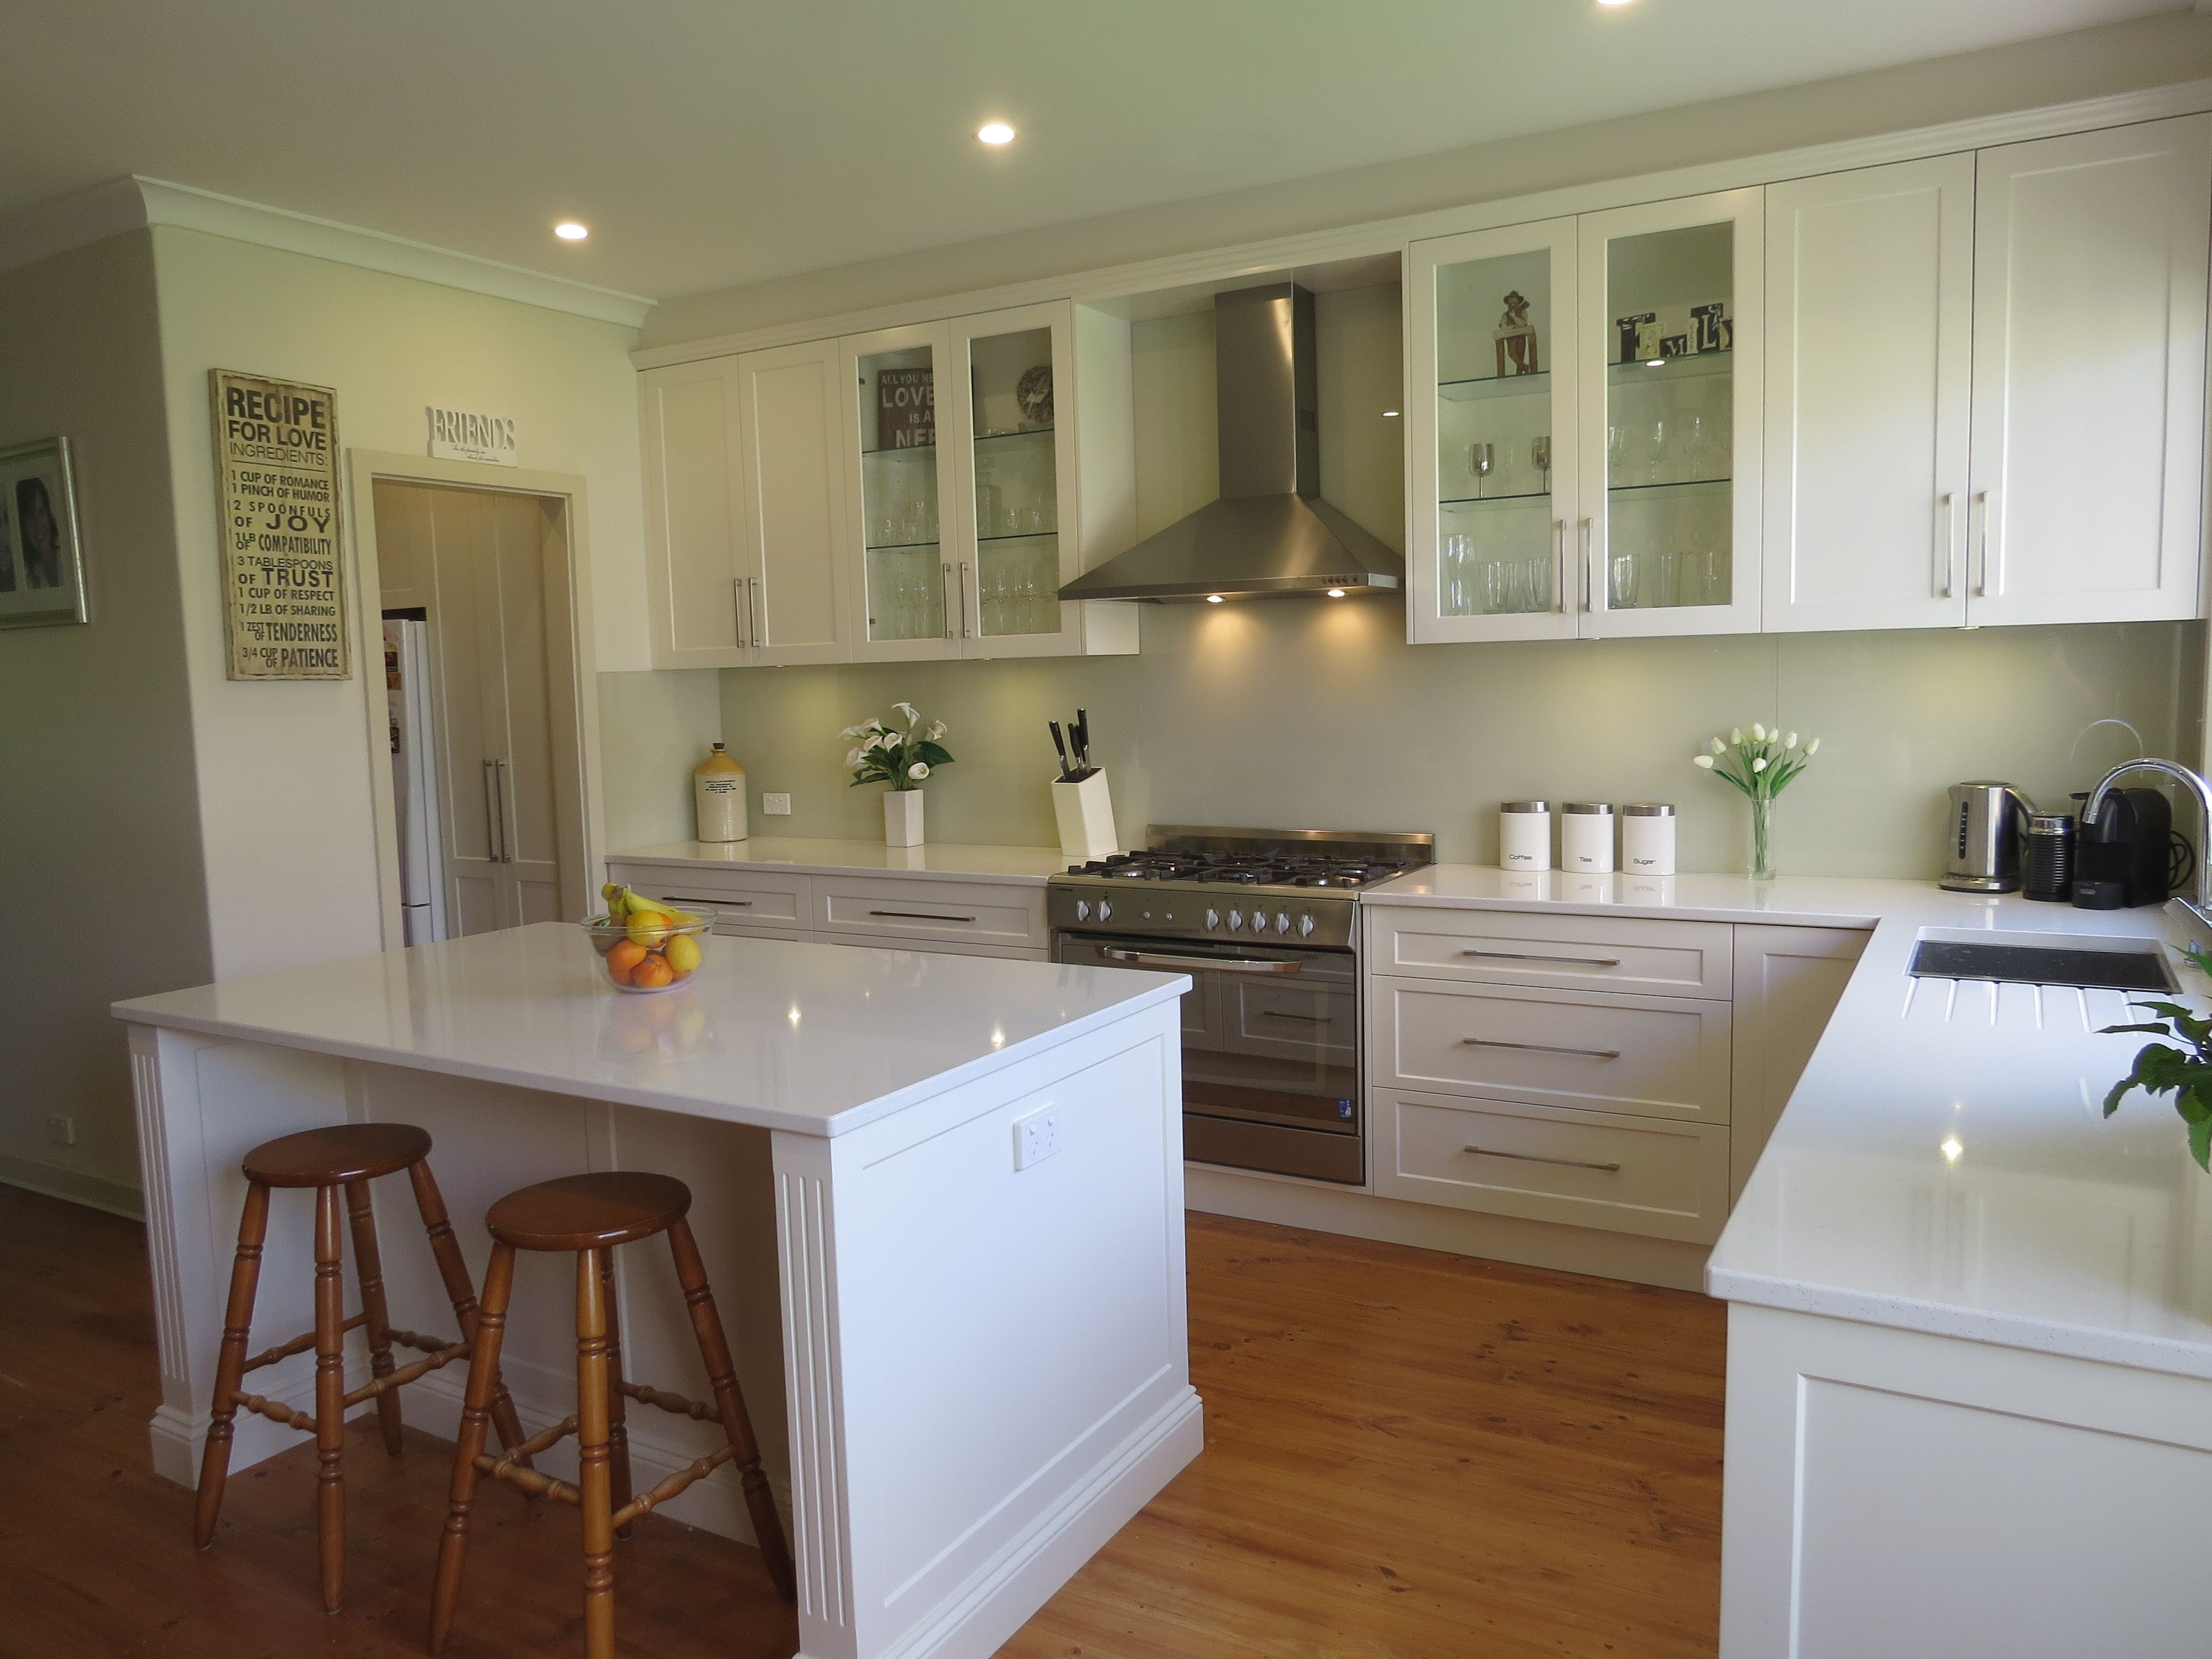 Traditional Kitchen - Tops - 30mm Essa Stone \'Torrone\'. Doors ...